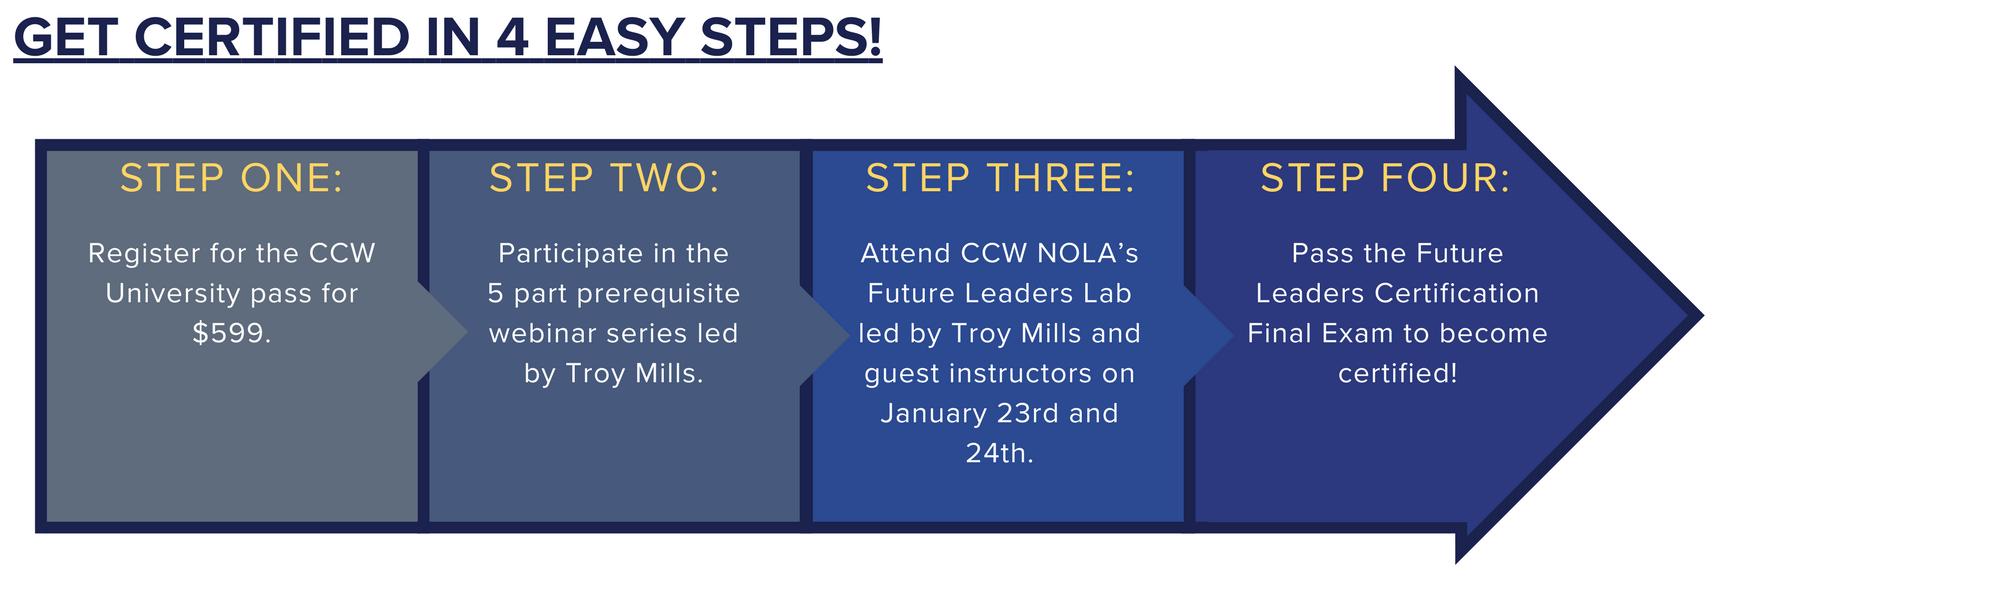 CCWU Steps